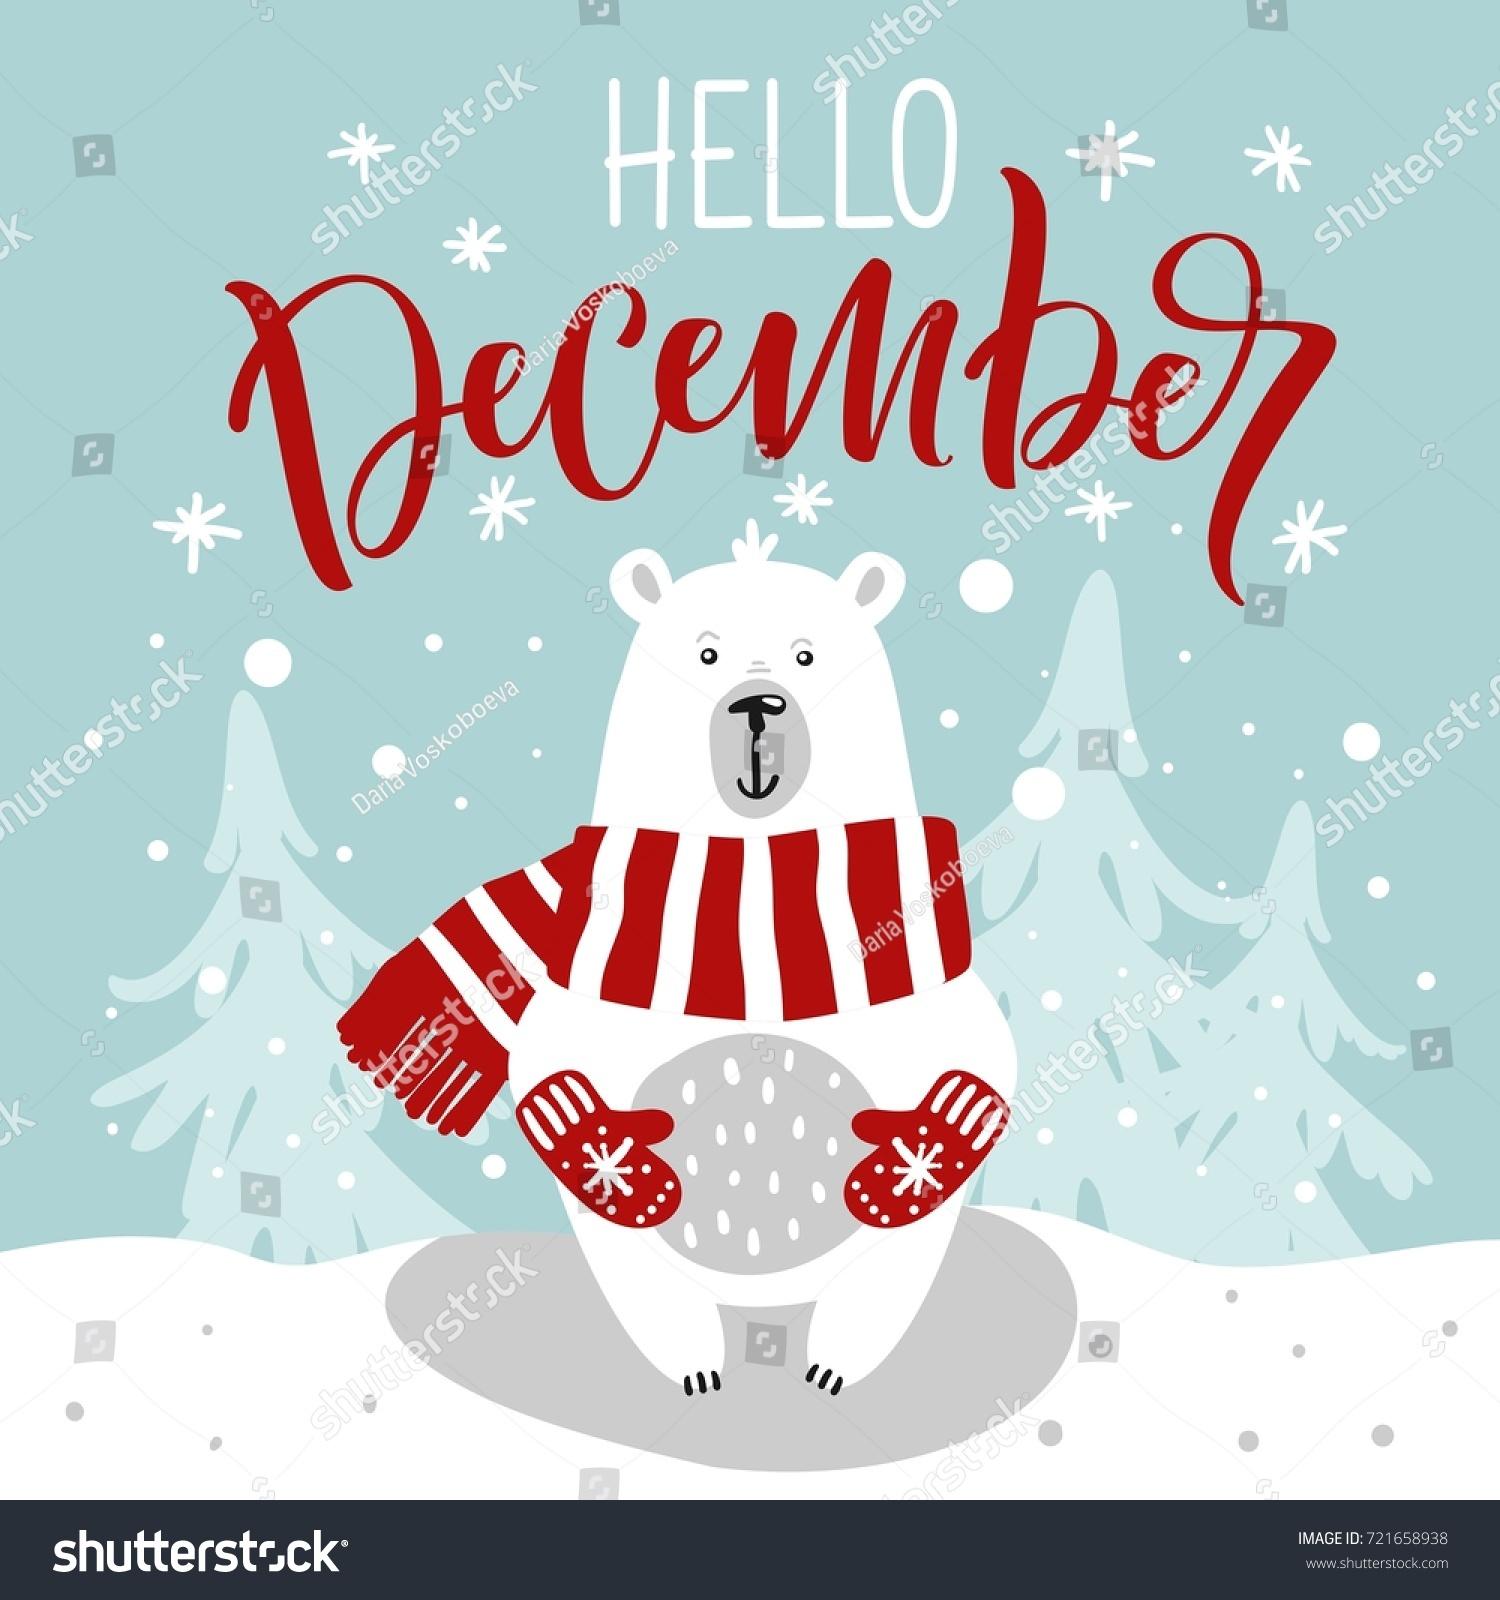 Winter greeting card cute hand drawn stock vector royalty free winter greeting card with cute hand drawn polar bear hand drawn lettering phrase hello m4hsunfo